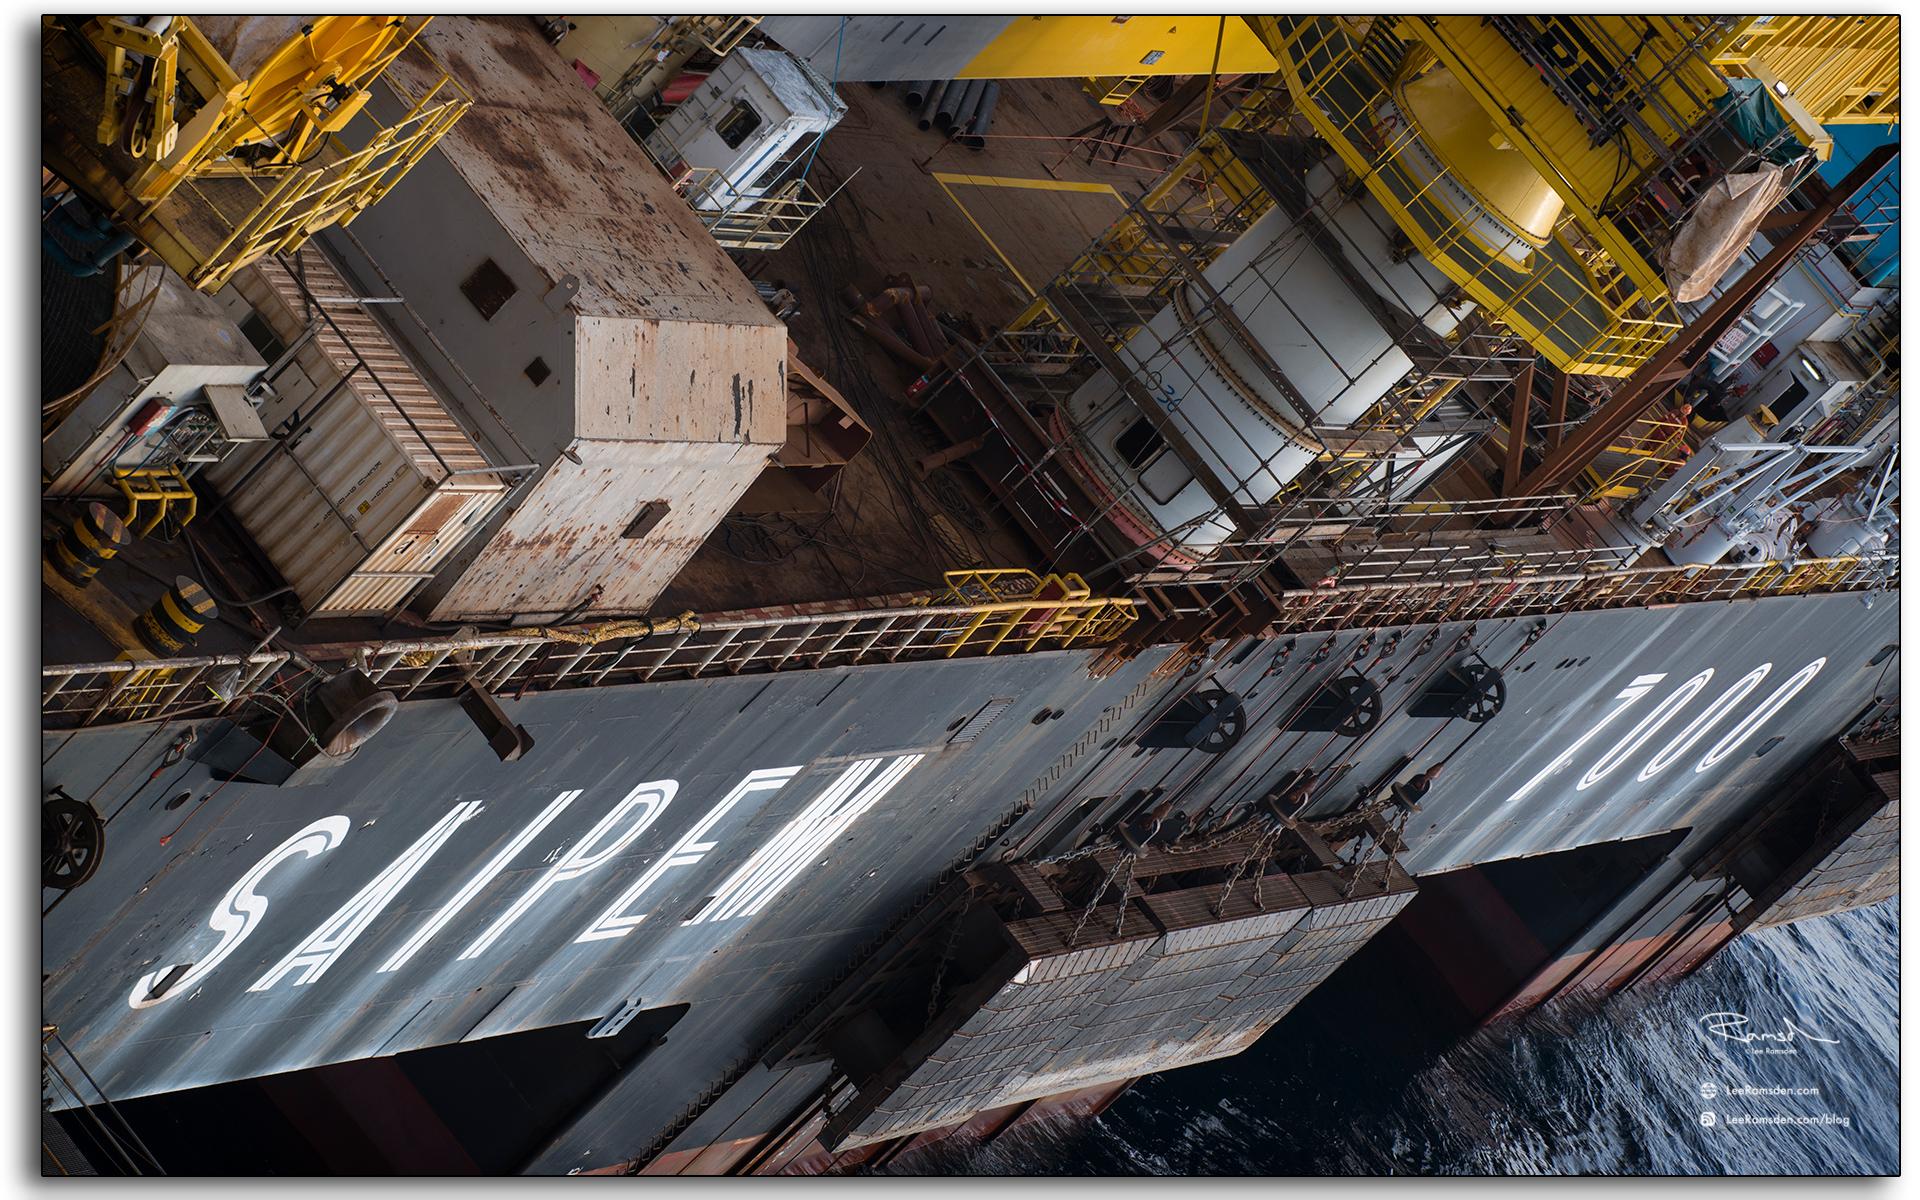 Lifting vessel, heavy, 14 thousand tonnes, S7000, Saipem